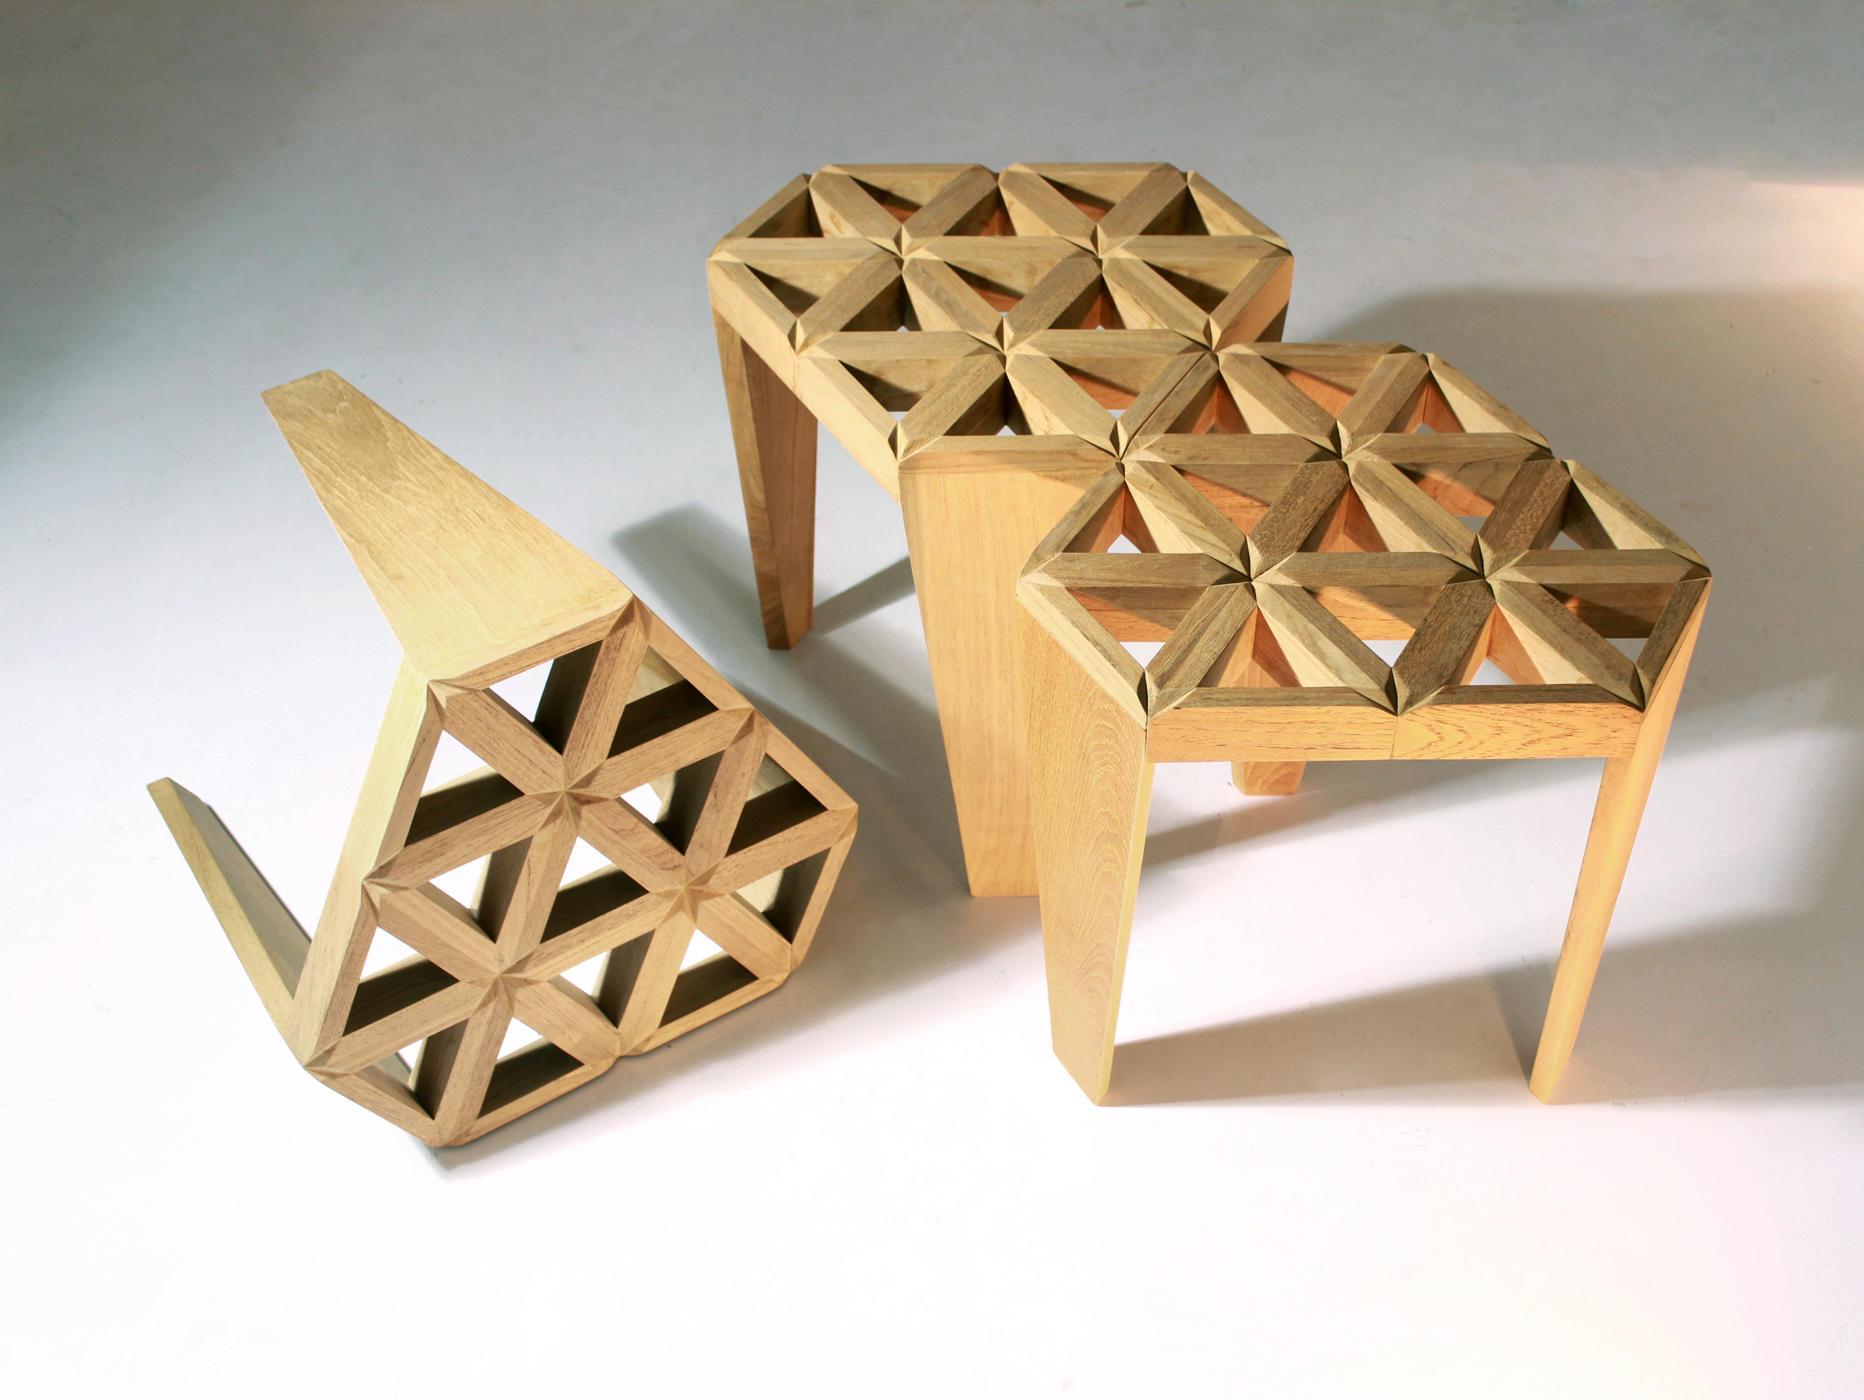 ... Star Stool by Deesawat ...  sc 1 st  Architonic & STAR STOOL - Garden stools from Deesawat | Architonic islam-shia.org